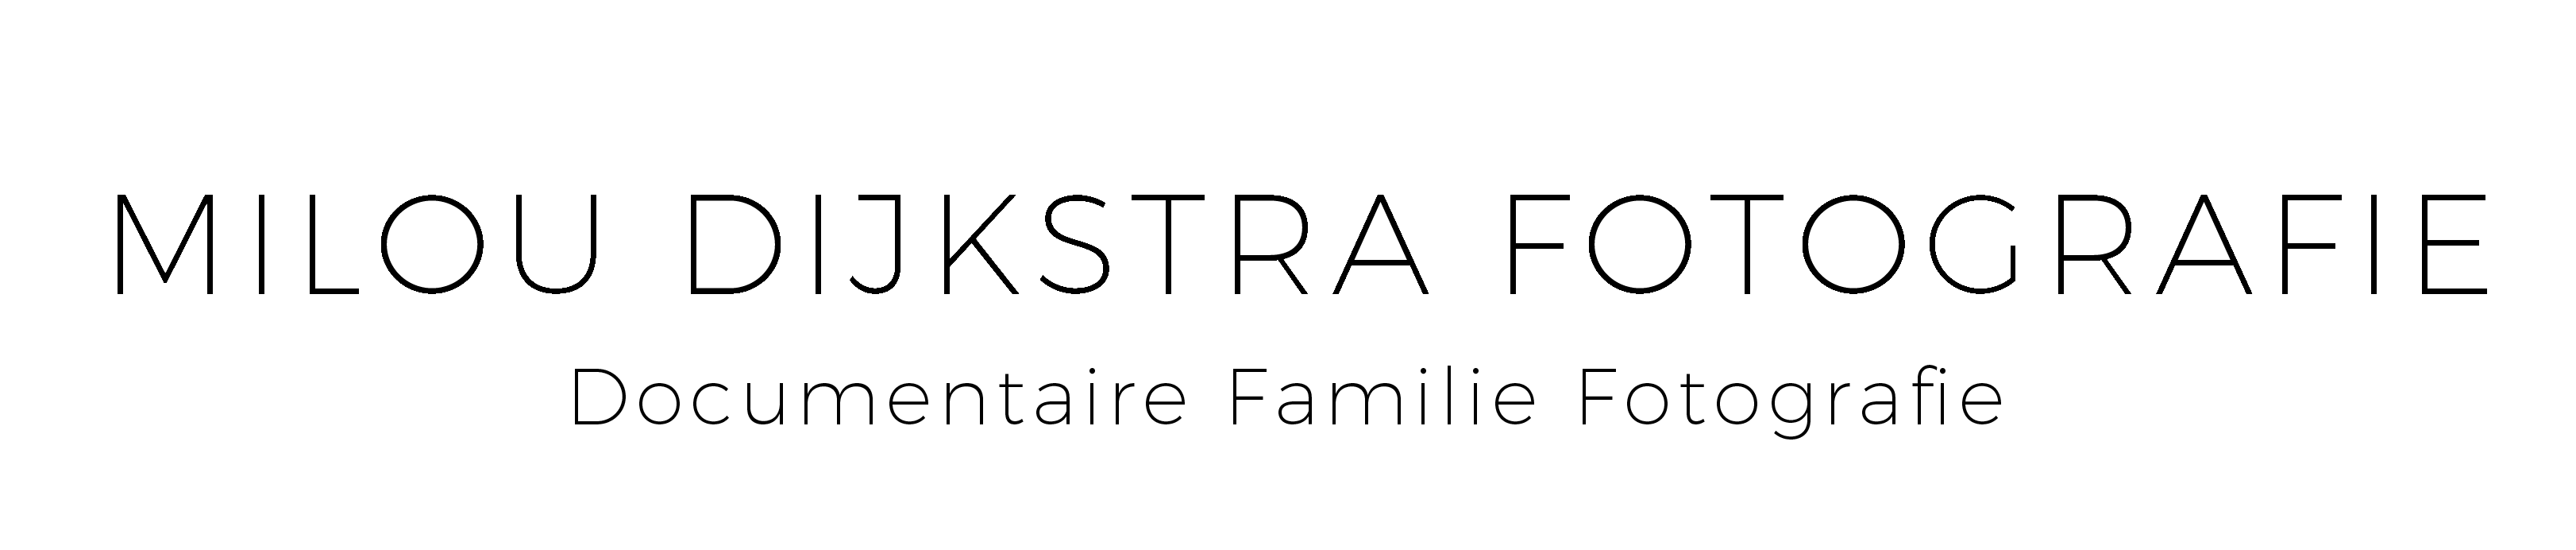 Logo-Milou-Dijkstra-Fotografie